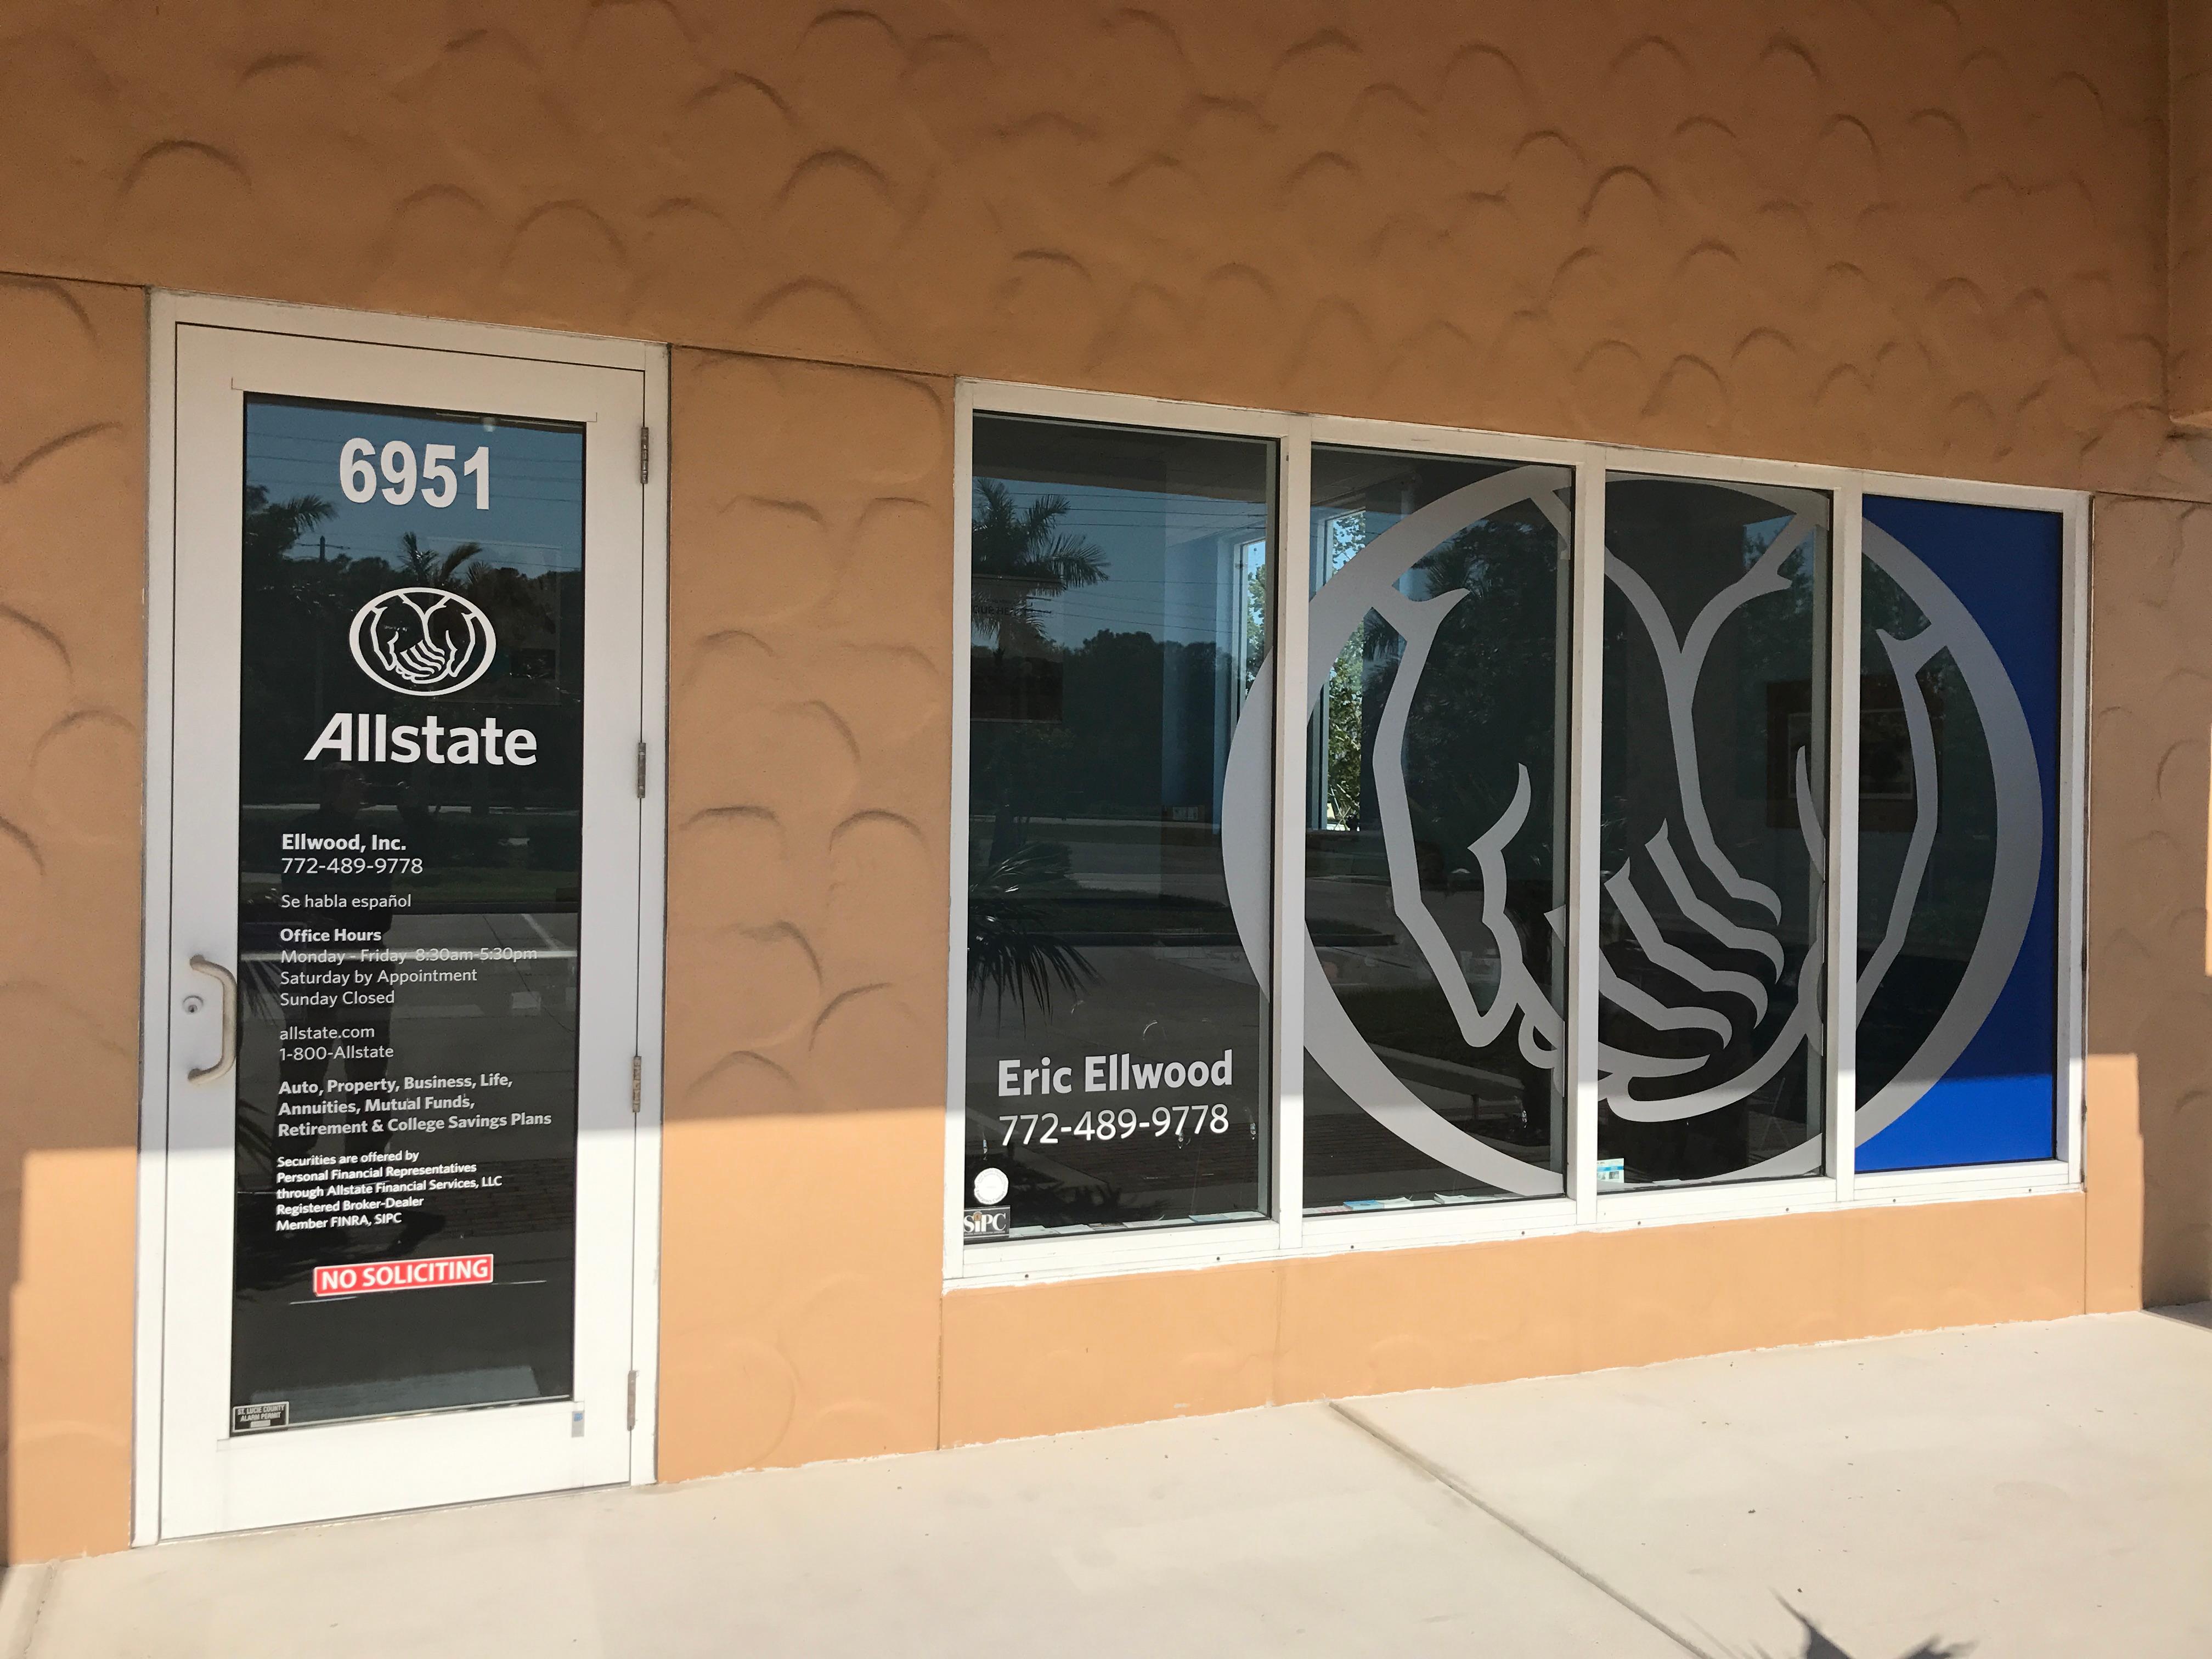 Eric Ellwood: Allstate Insurance image 2